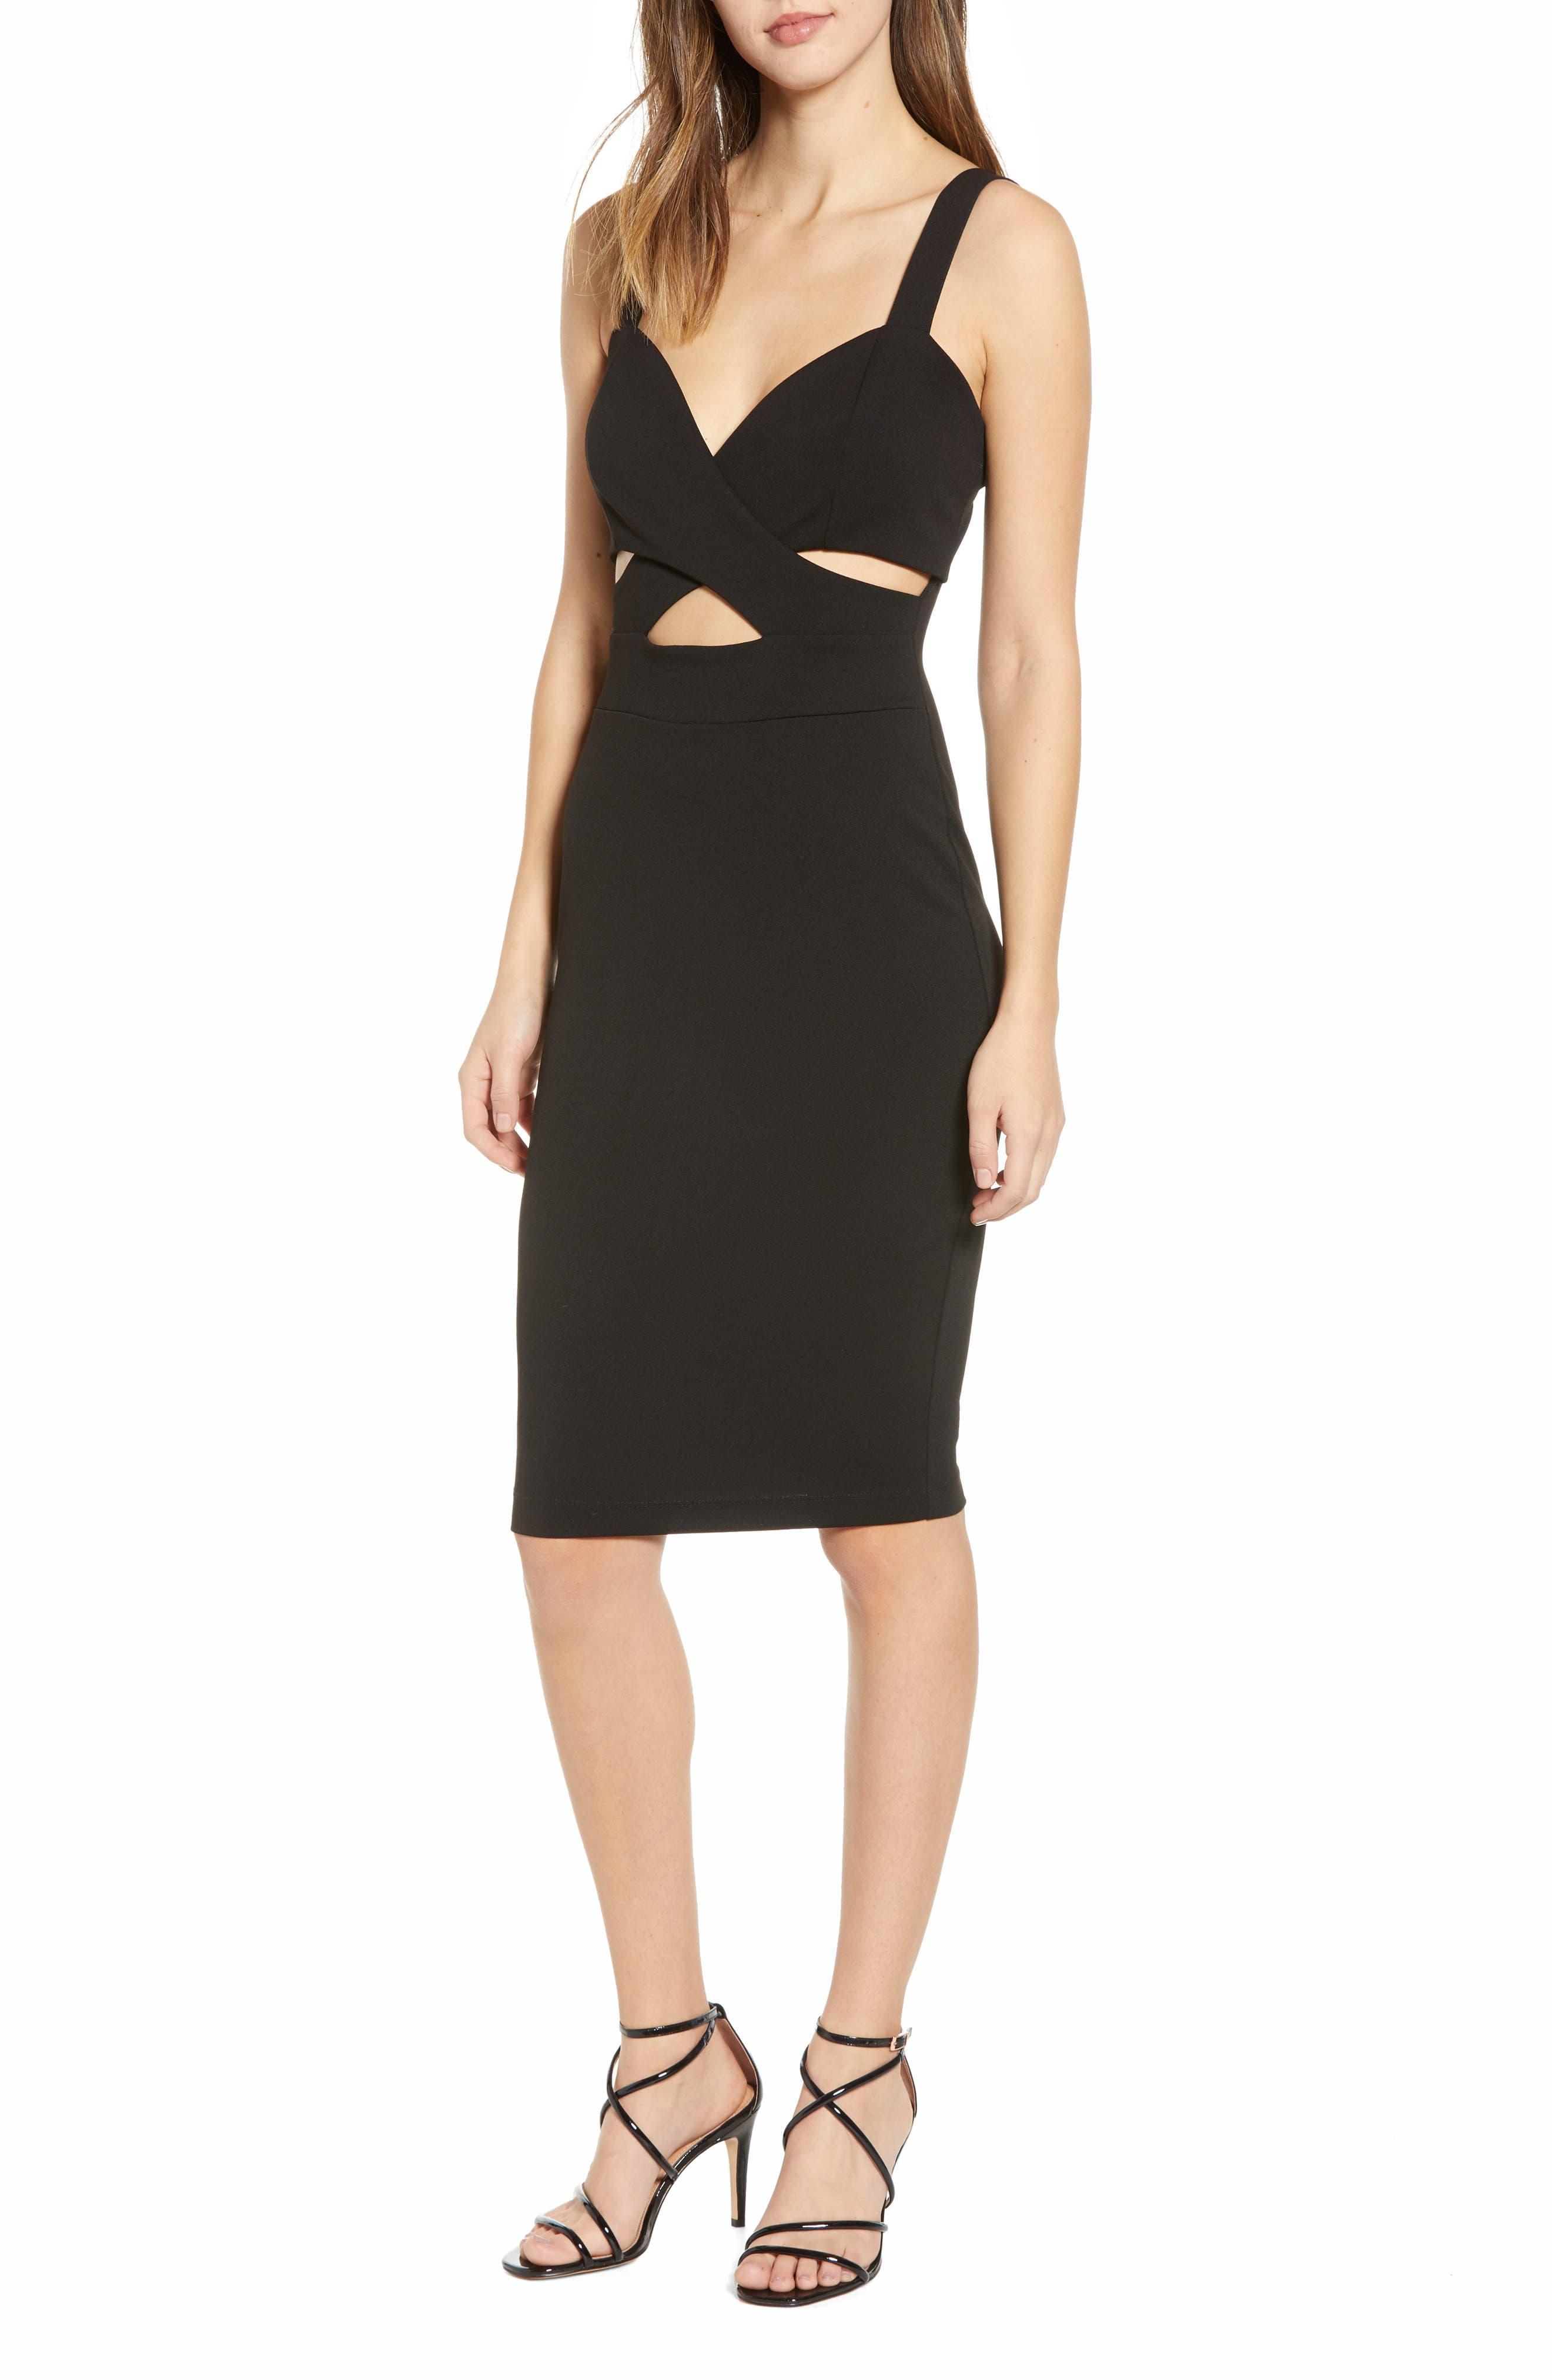 Love, Nickie Lew Cutout Sheath Dress, Black